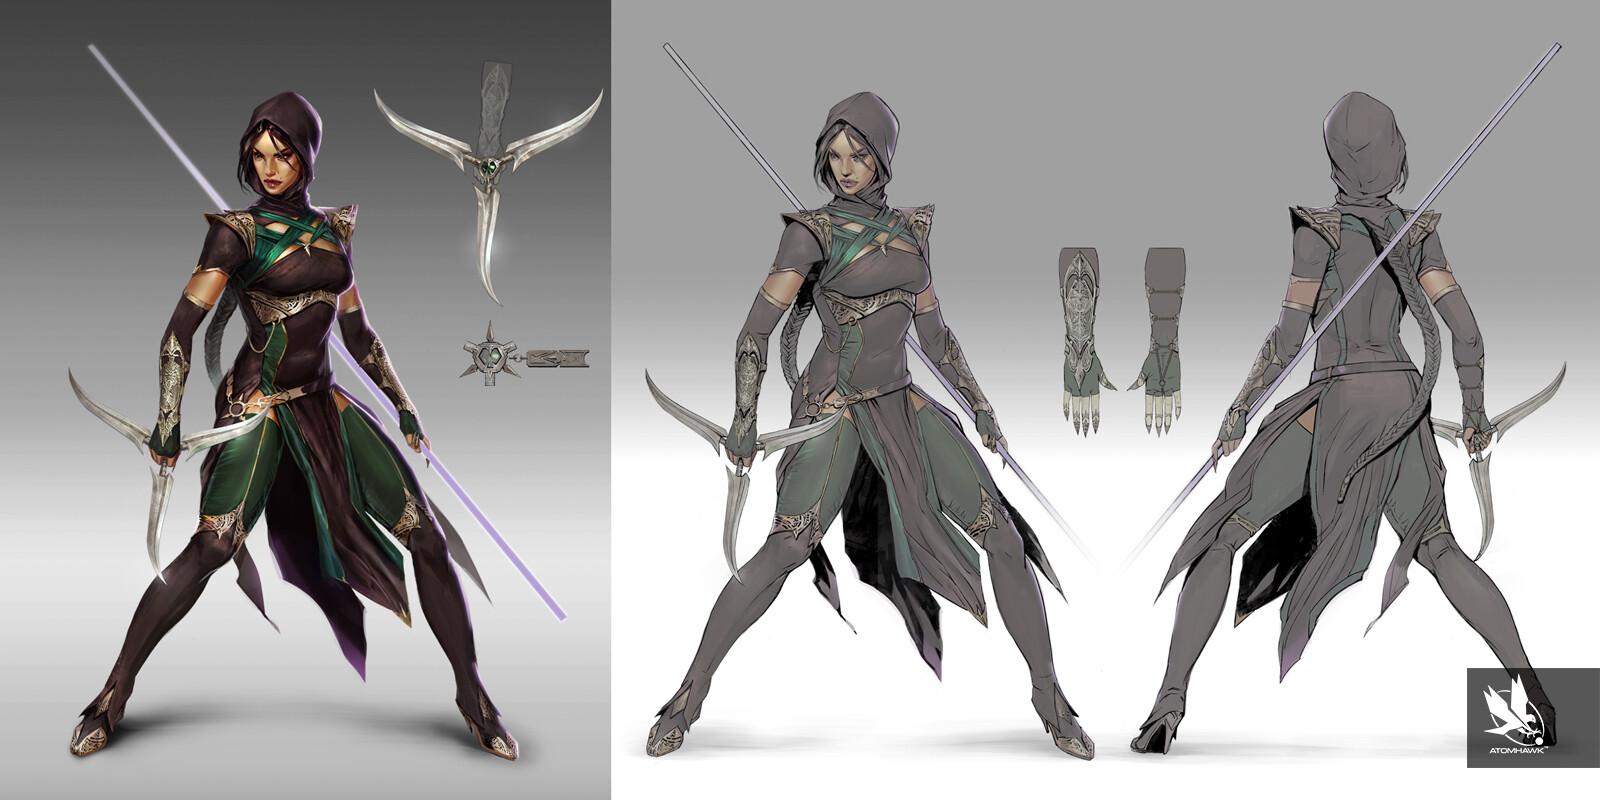 Artstation Mortal Kombat 11 Characters Atomhawk Design